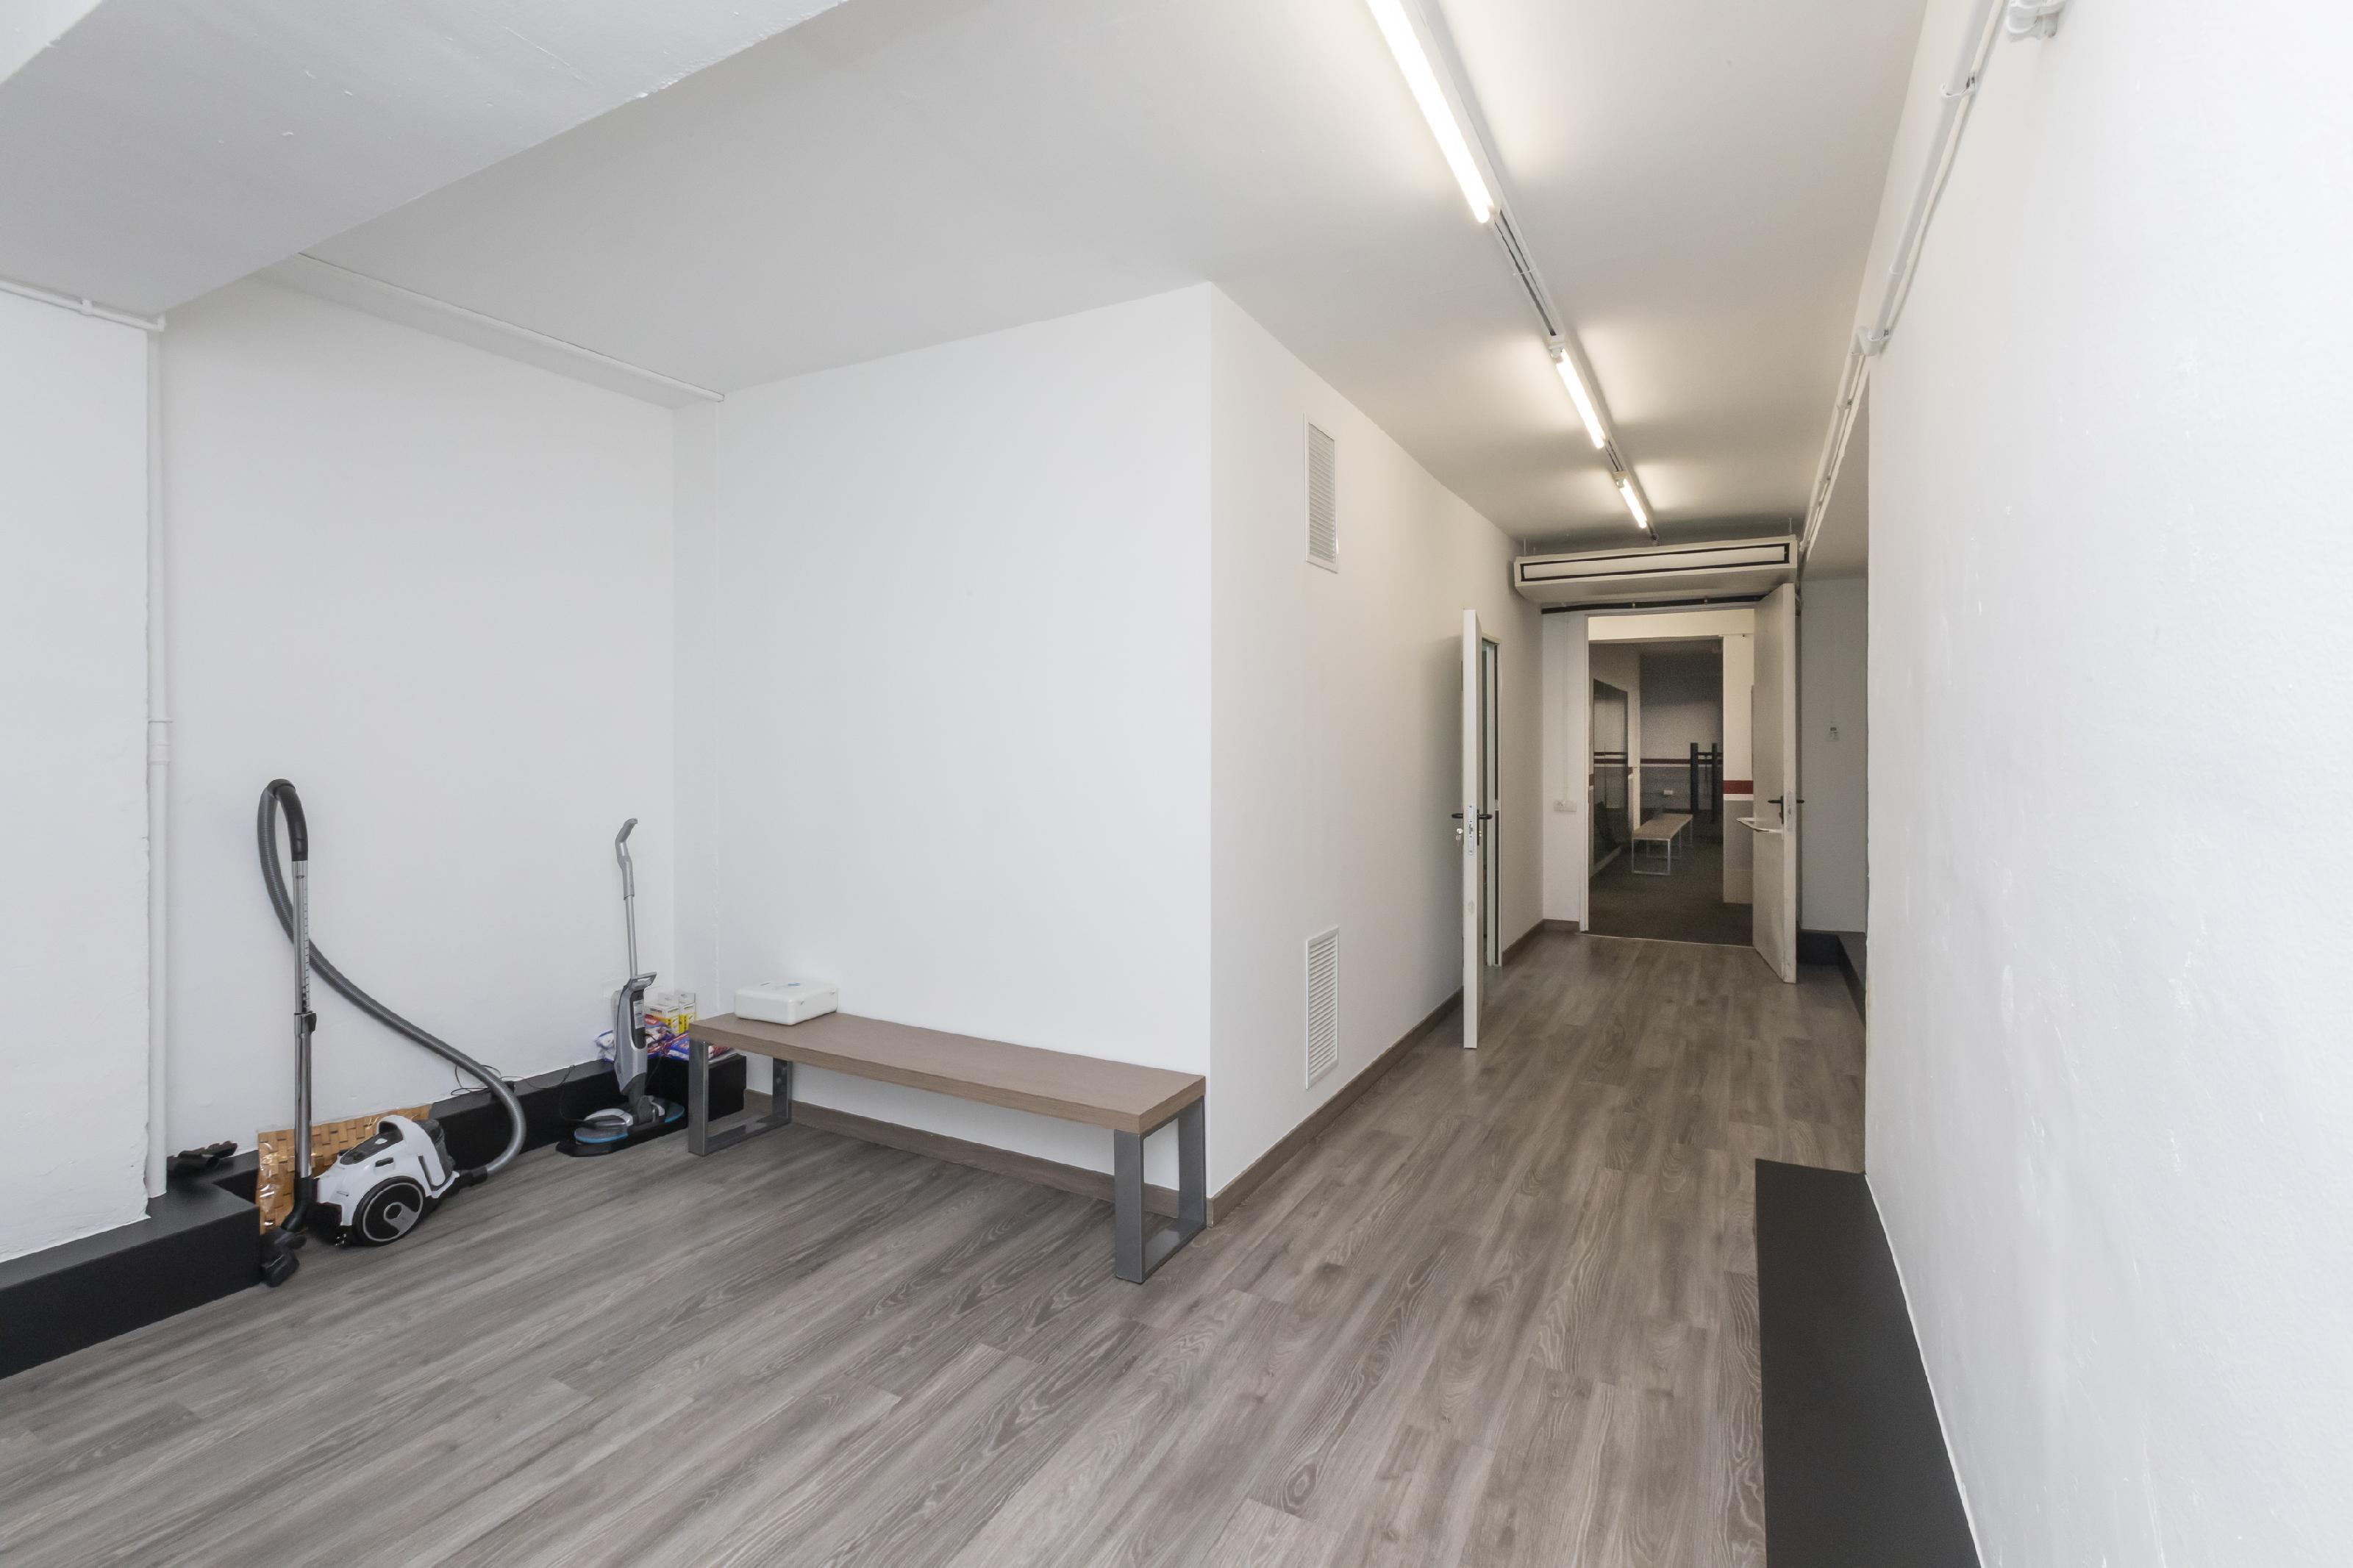 249493 Commercial premises for sale in Sarrià-Sant Gervasi, Sant Gervasi-Galvany 21